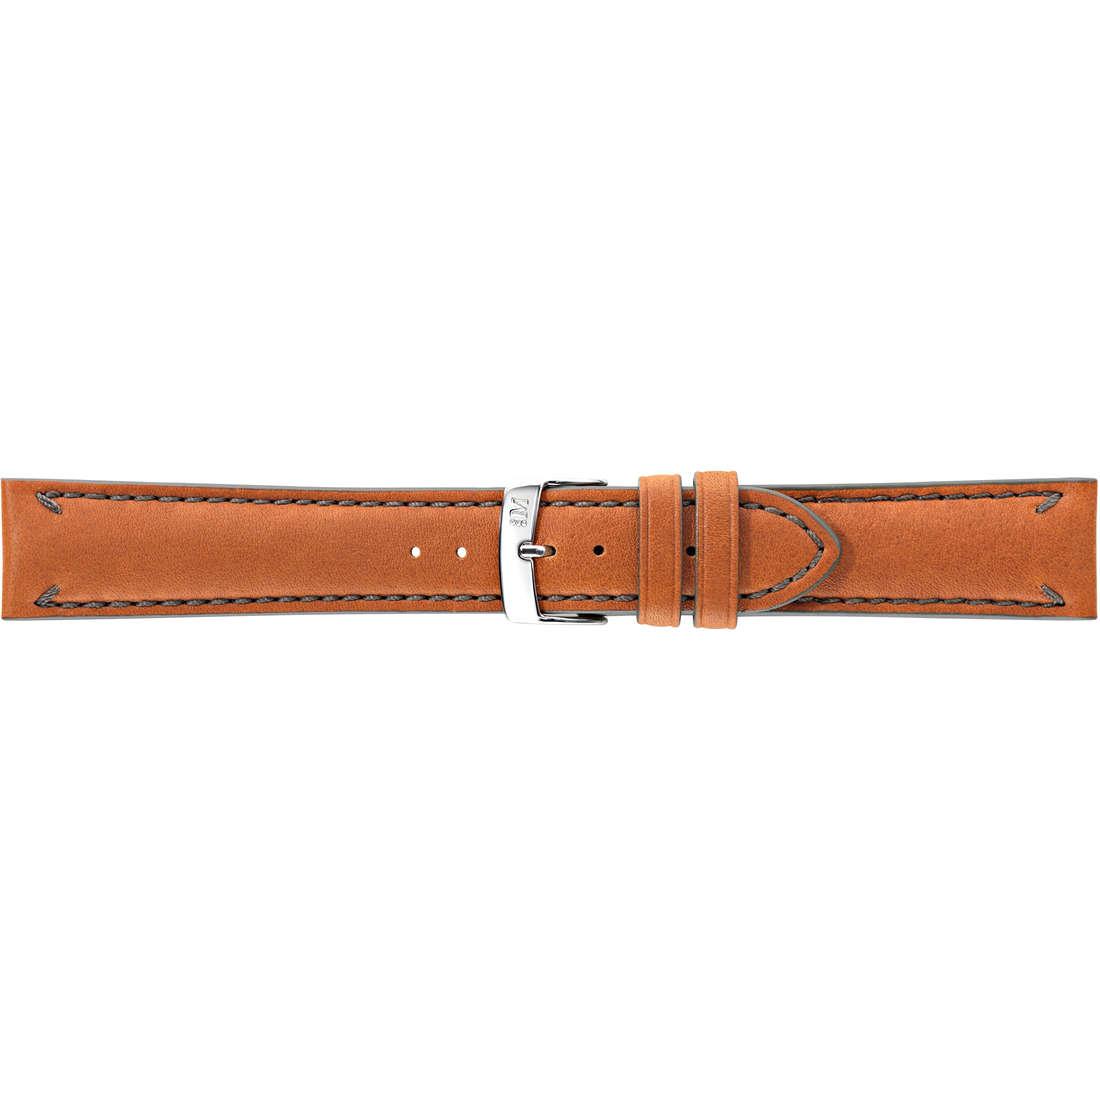 montre bande de montres homme Morellato Manufatti A01X4540A61044CR18